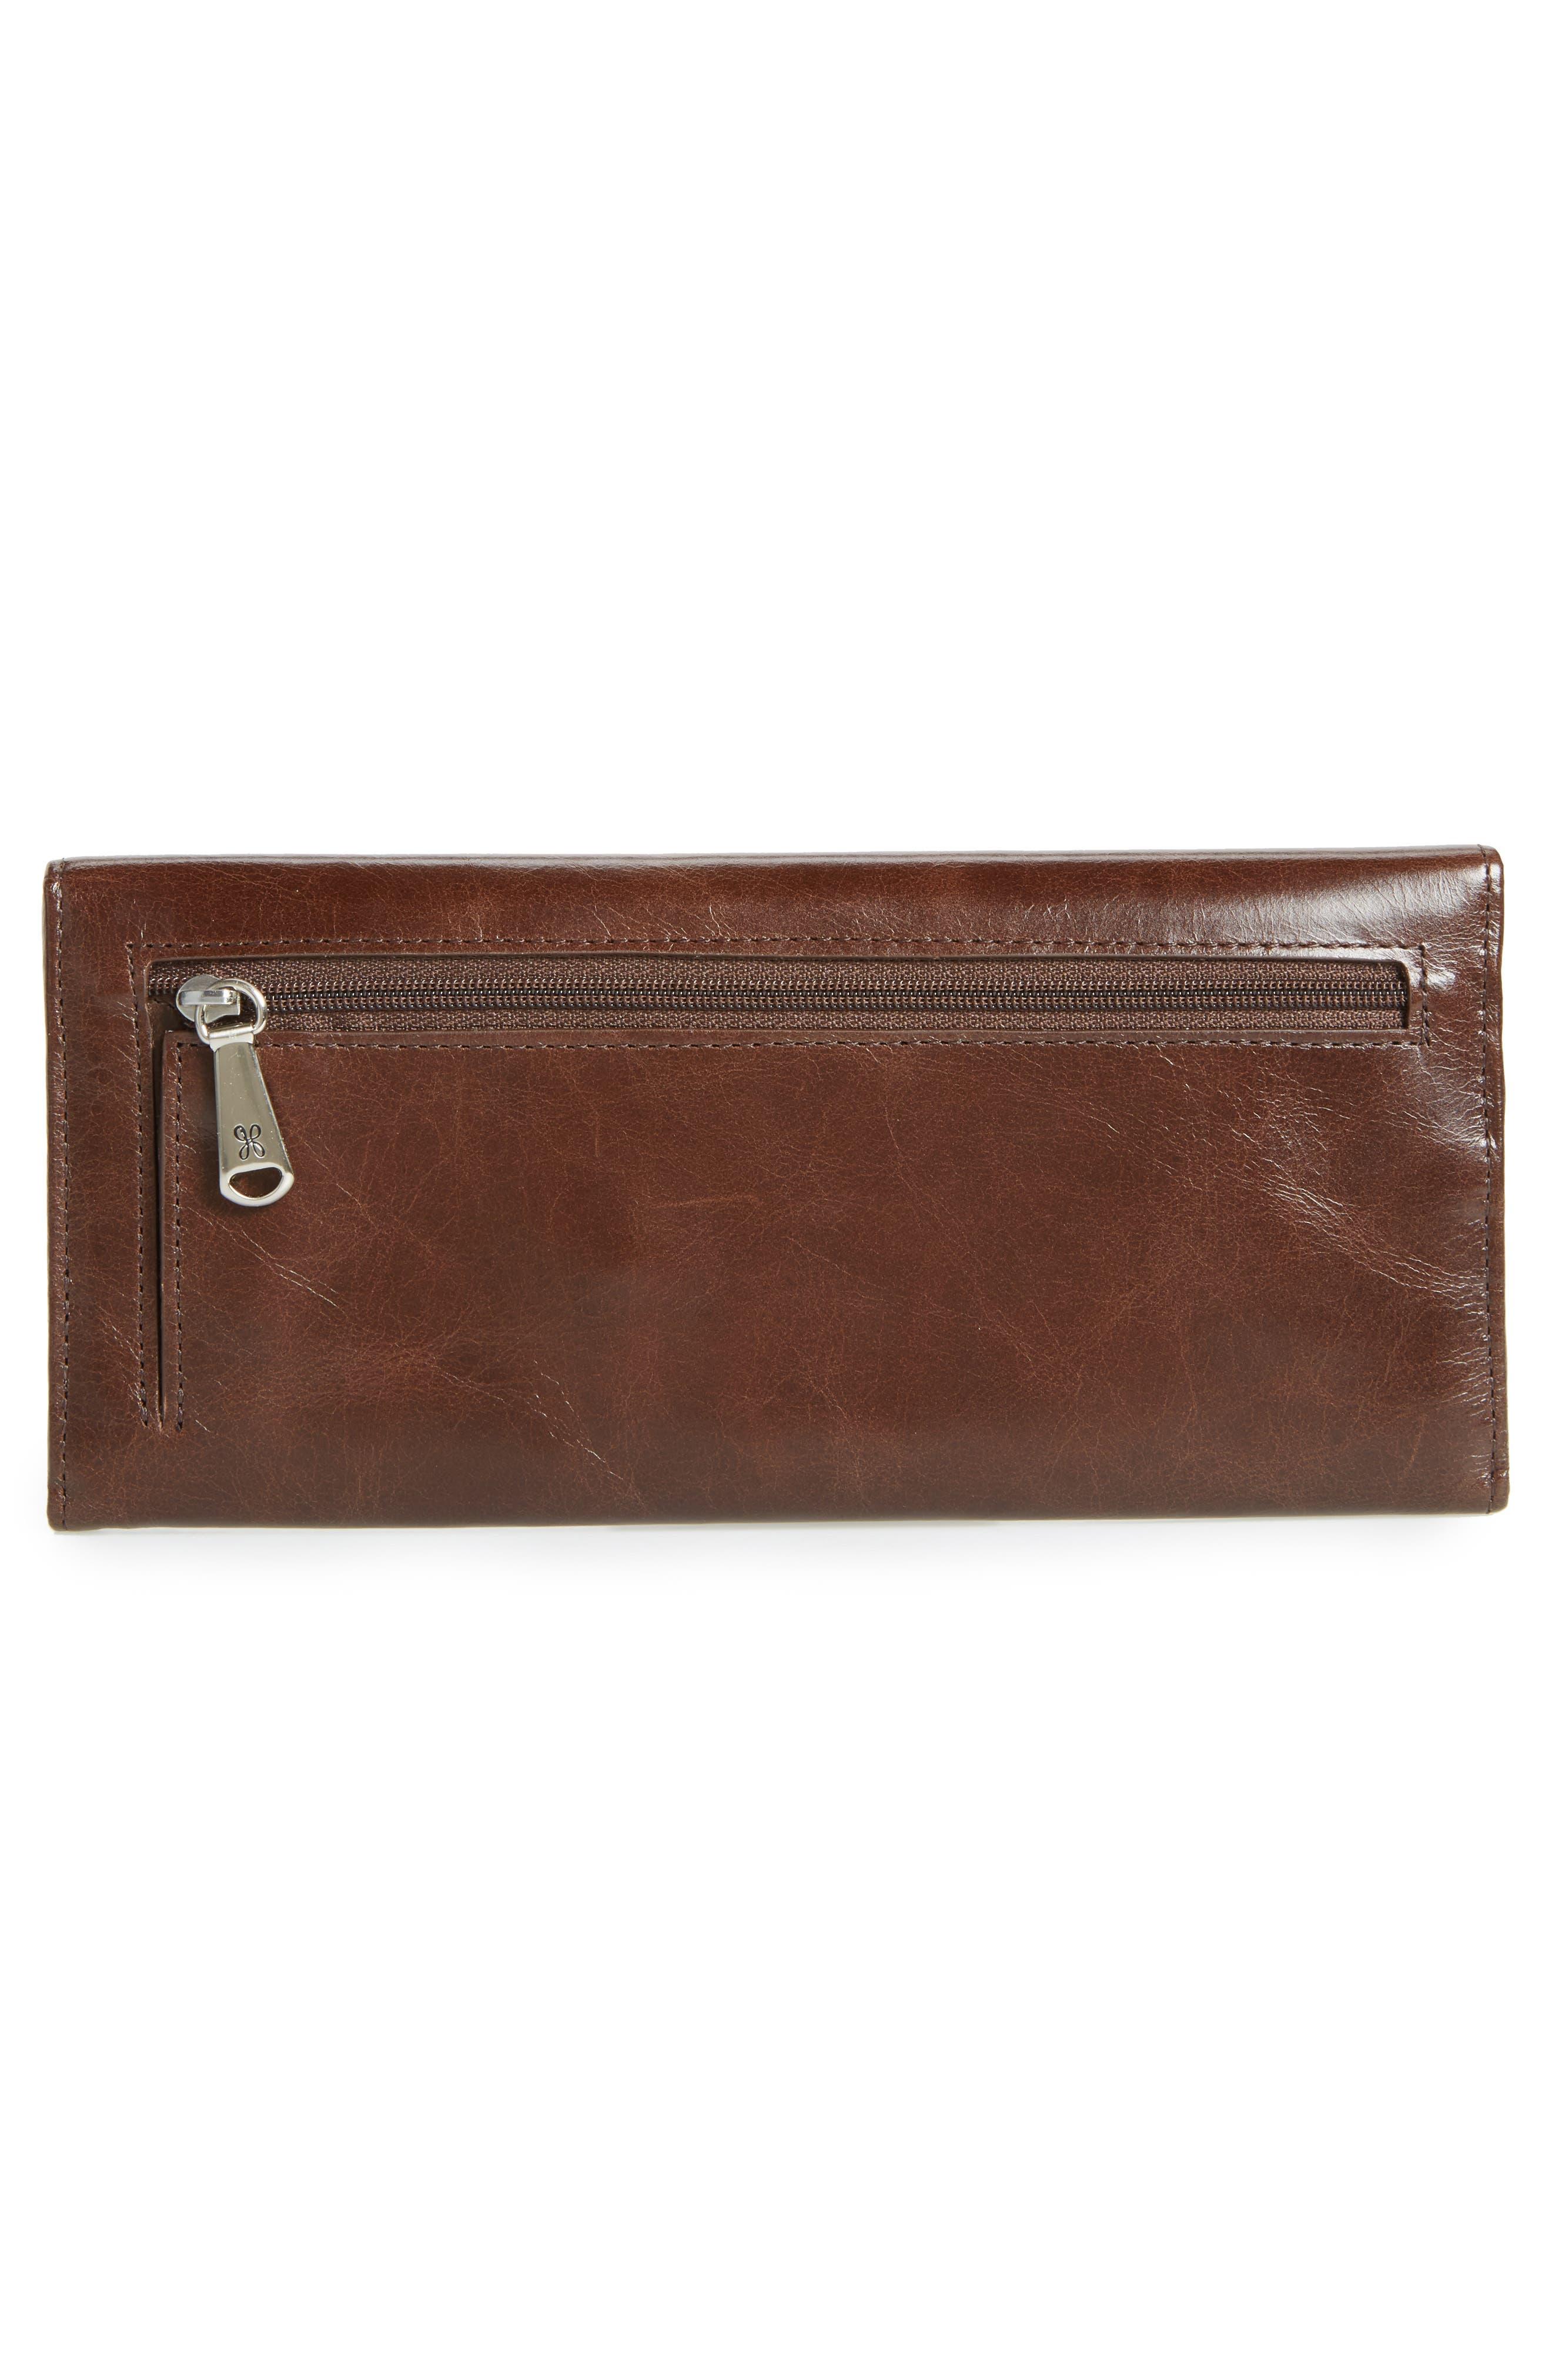 'Sadie' Leather Wallet,                             Alternate thumbnail 105, color,